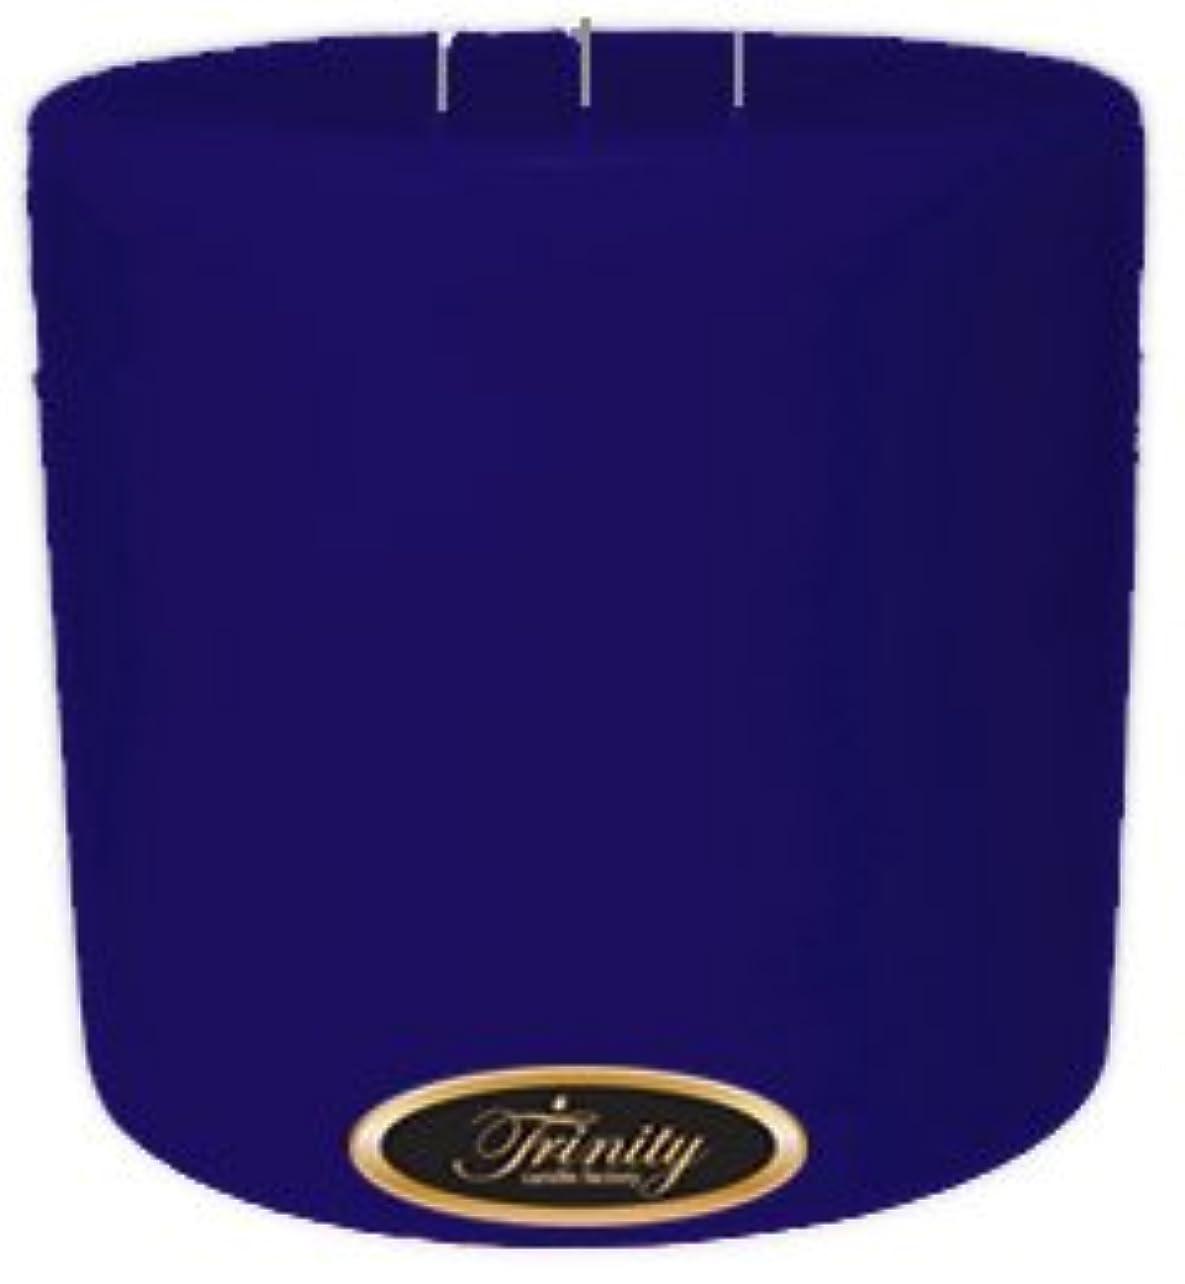 Trinity Candle工場 – Blueberry Fields – Pillar Candle – 6 x 6